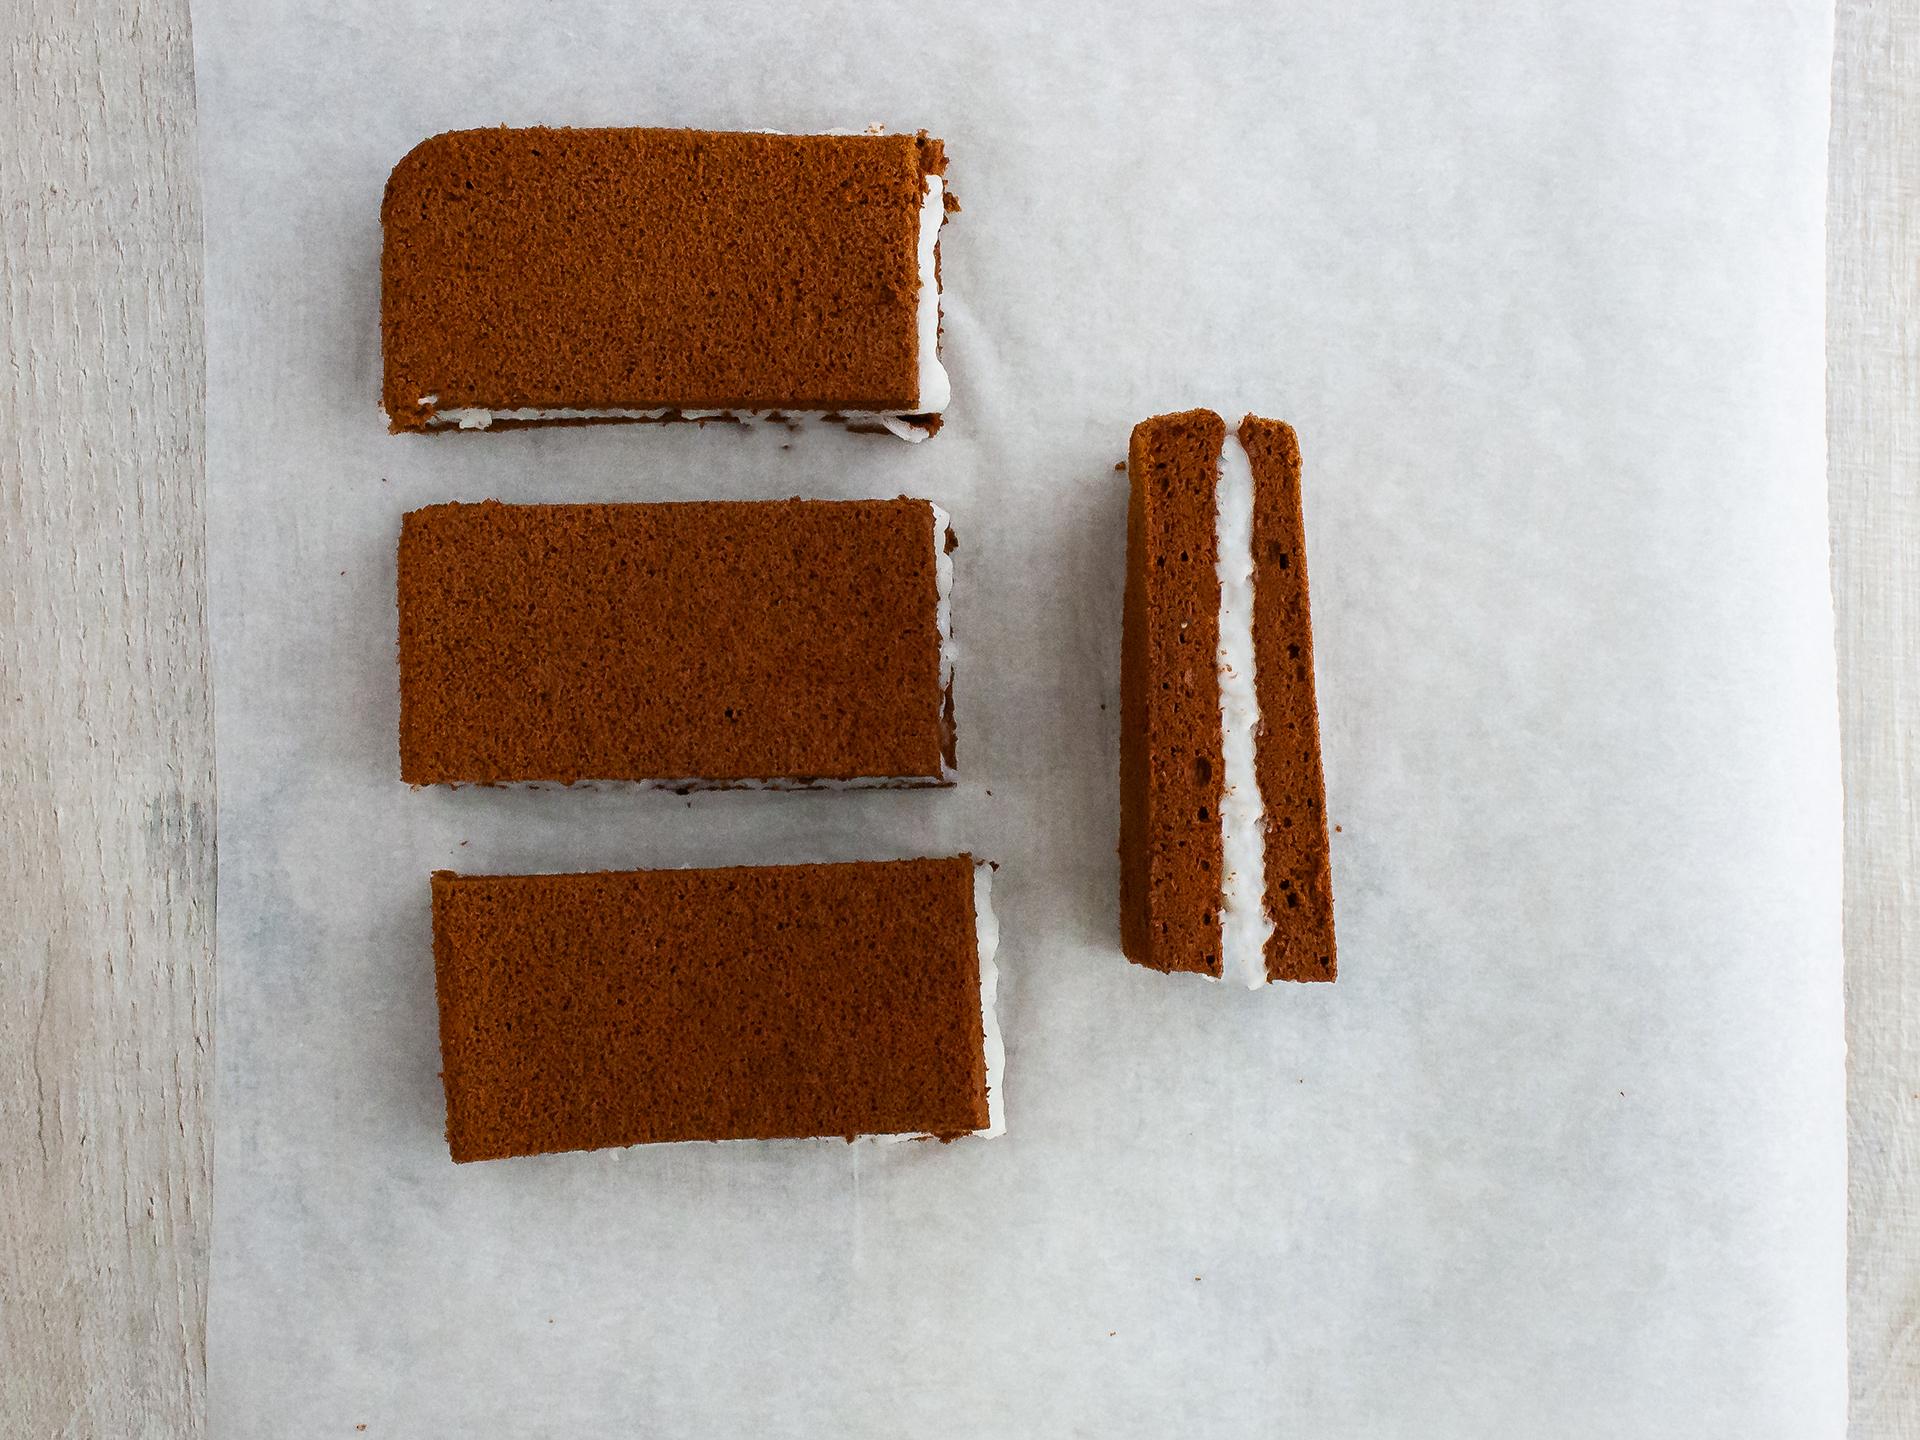 Step 4.2 of Dairy Free Chocolate Sandwich Cake Bar